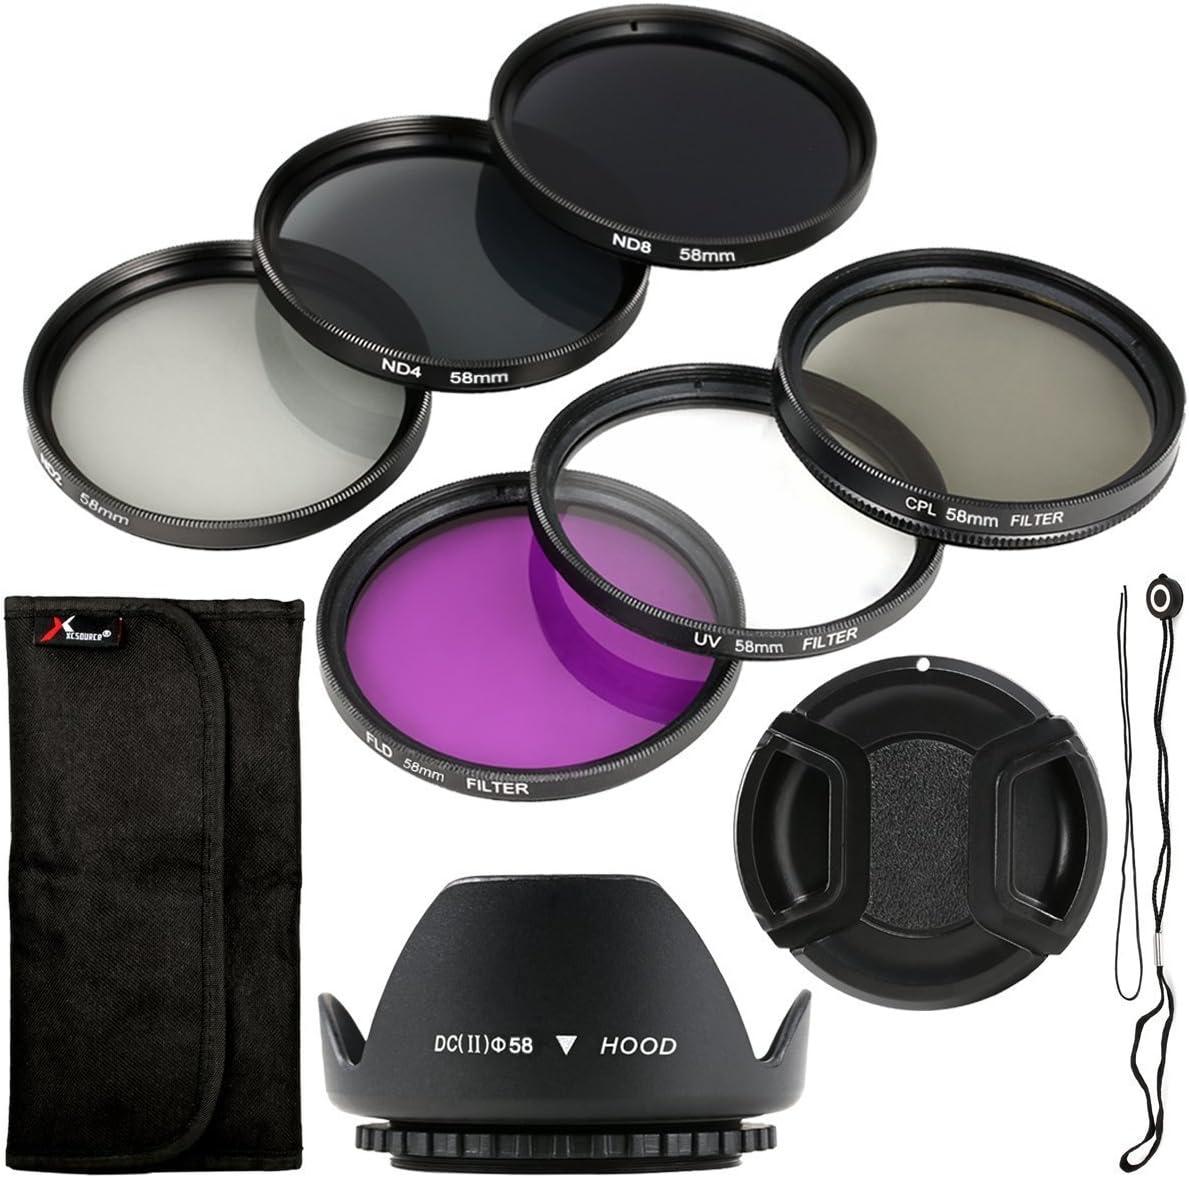 Pack de seis unidades de filtro y parasol UV CPL ND + soporte de 58mm para Canon EOS, Canon EOS Rebel, XSi, T4i, T3i, 70D, 60D, 700D, 650D, 1100D, 1000D, 600D, 50D, 550D, 1DX, 5D Mark, 5D2, 5D3, 6 Re